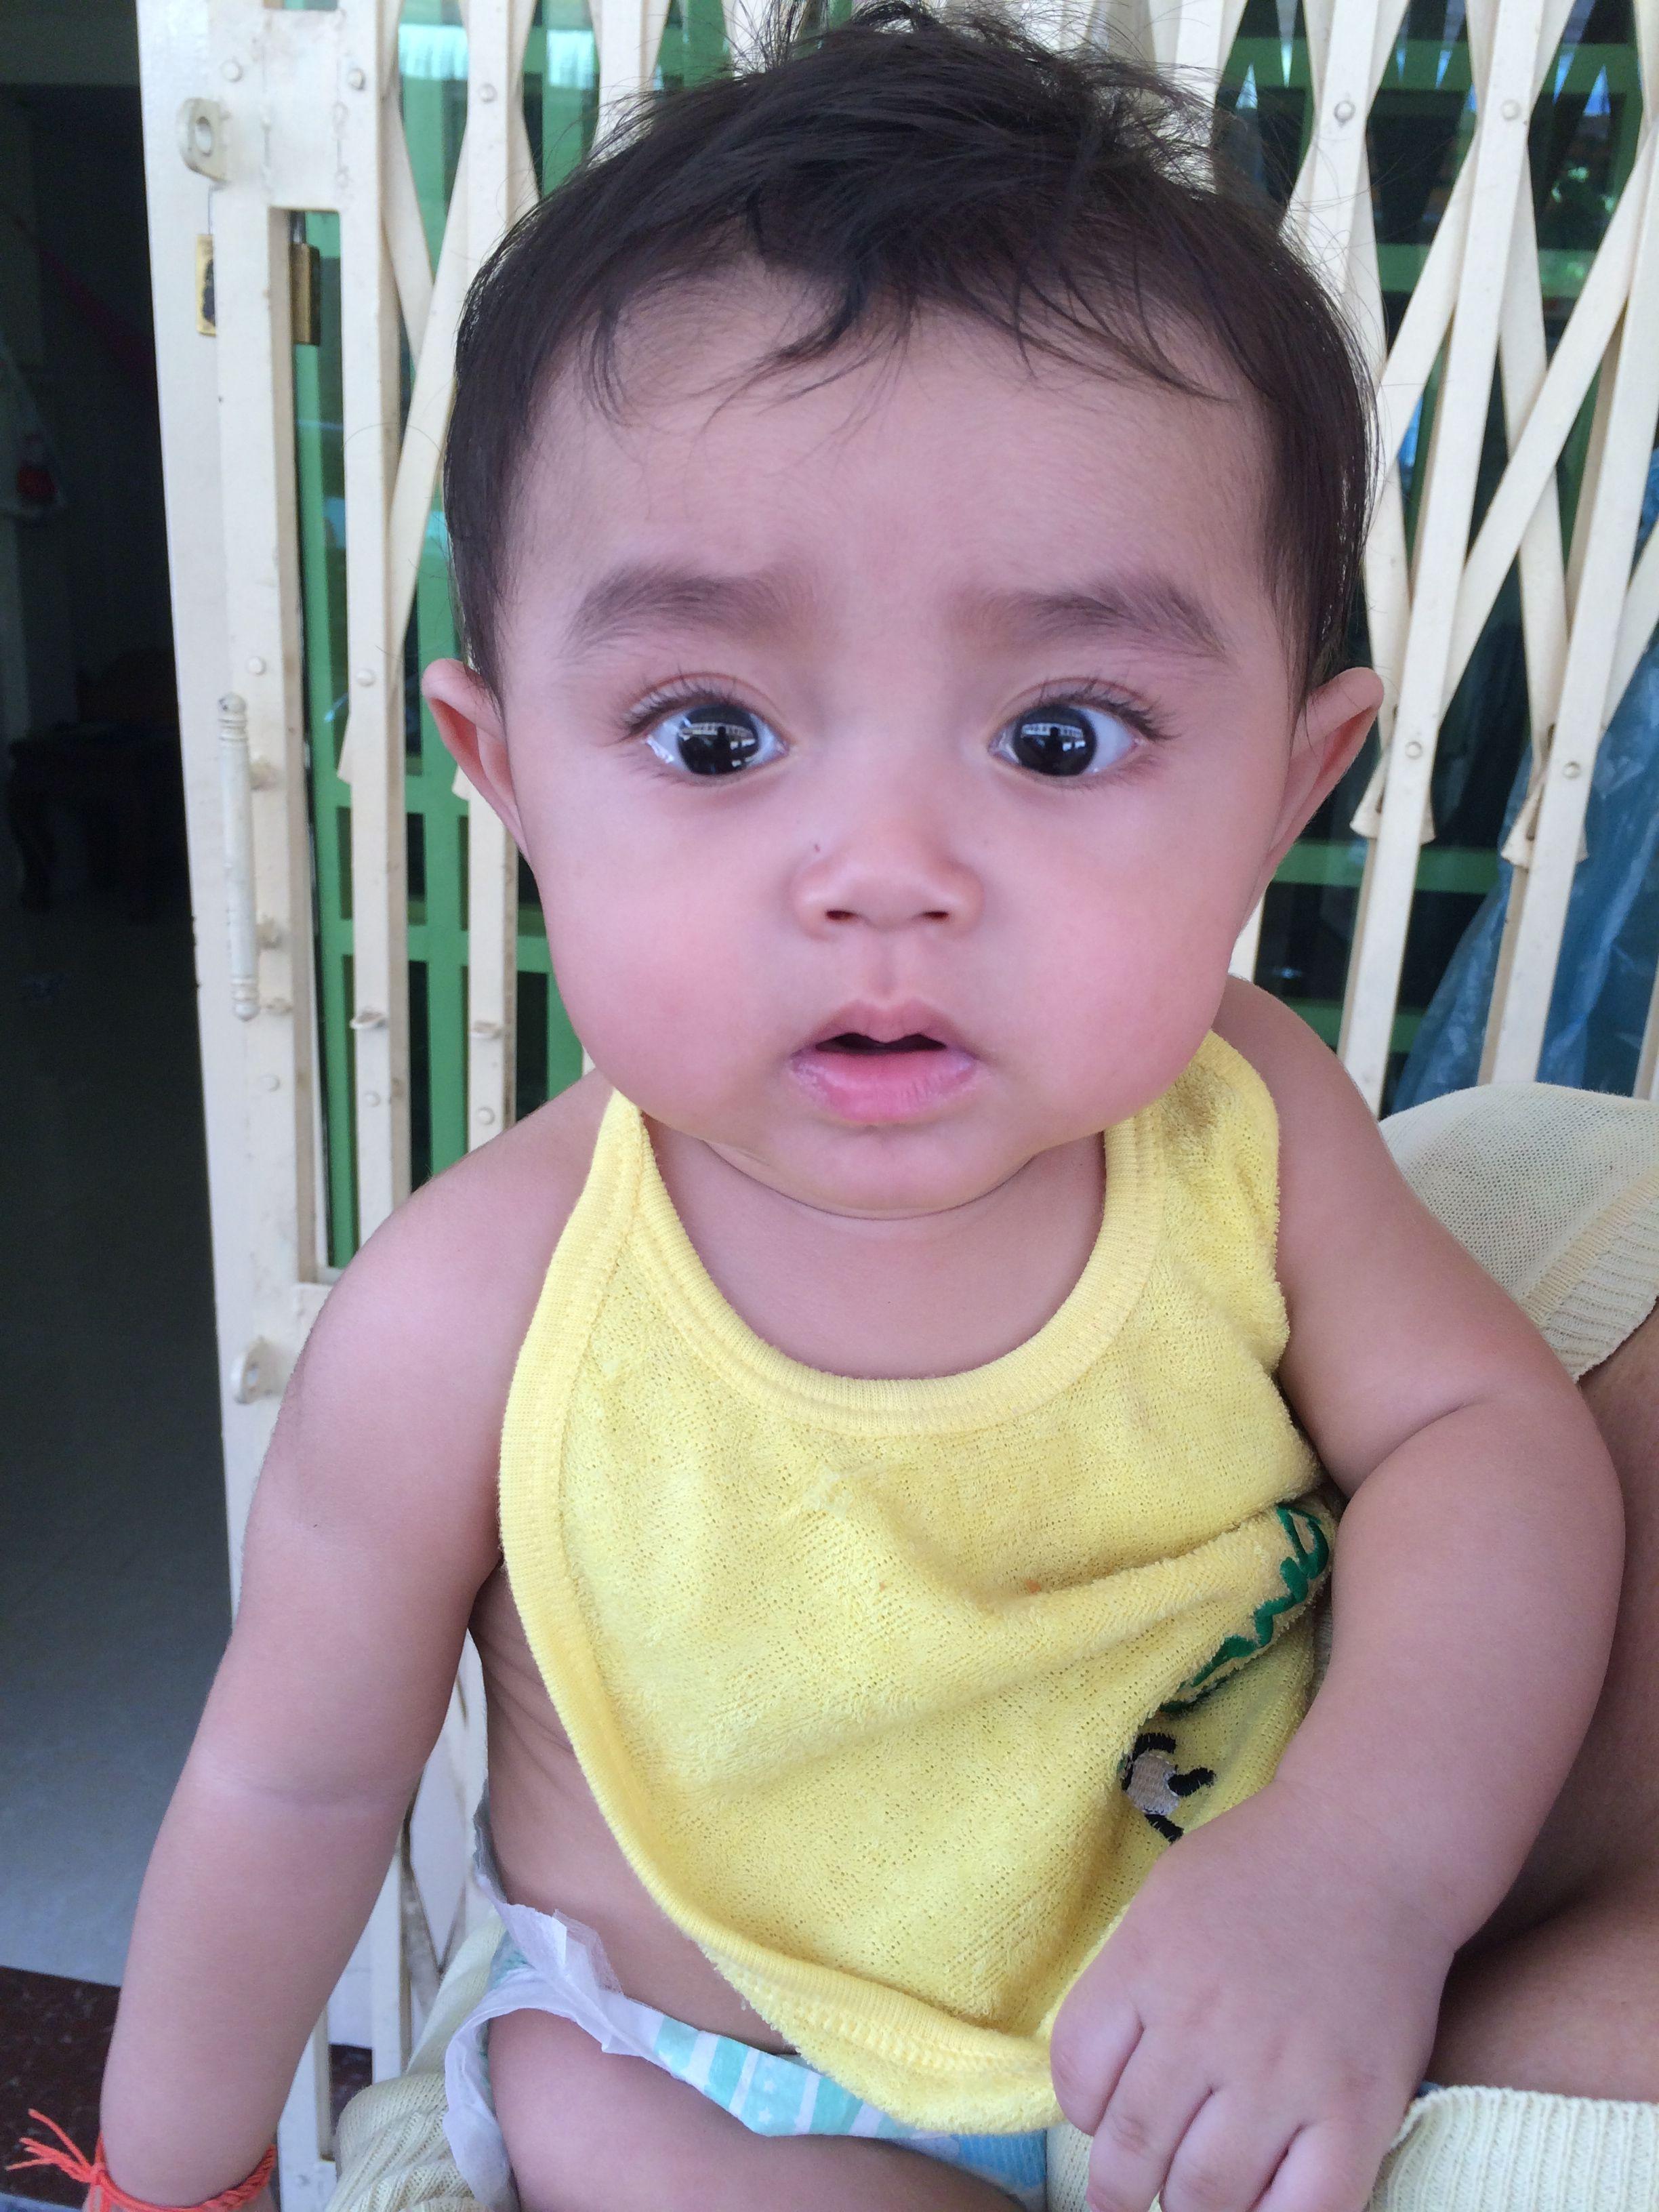 8month of my nephew